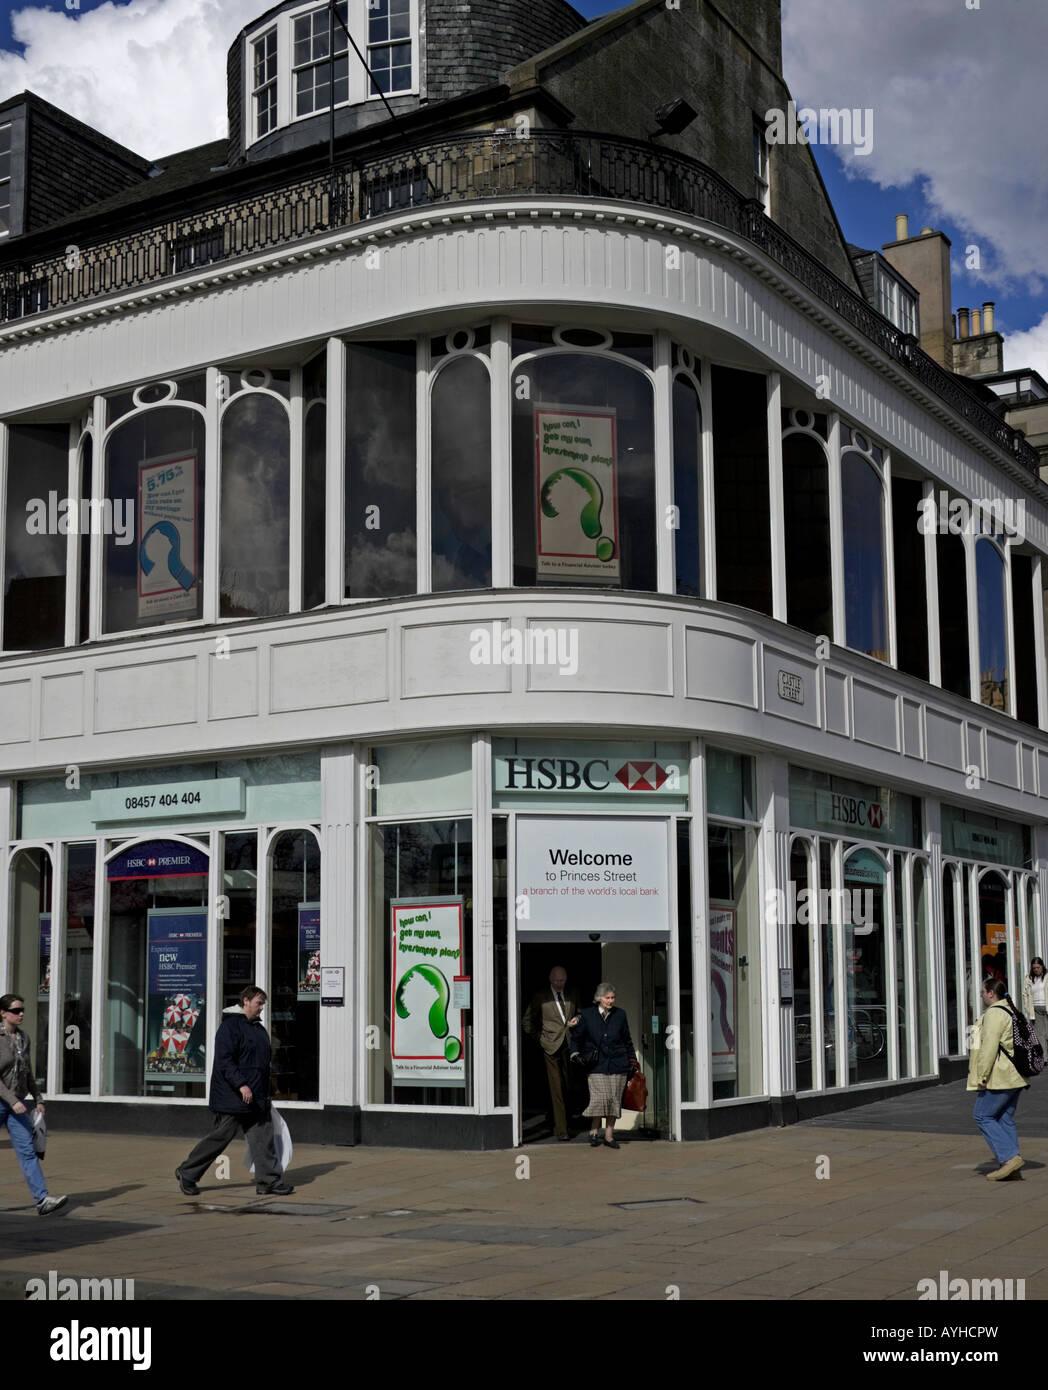 HSBC office, Princes Street, Edinburgh, Scotland, UK, Europe